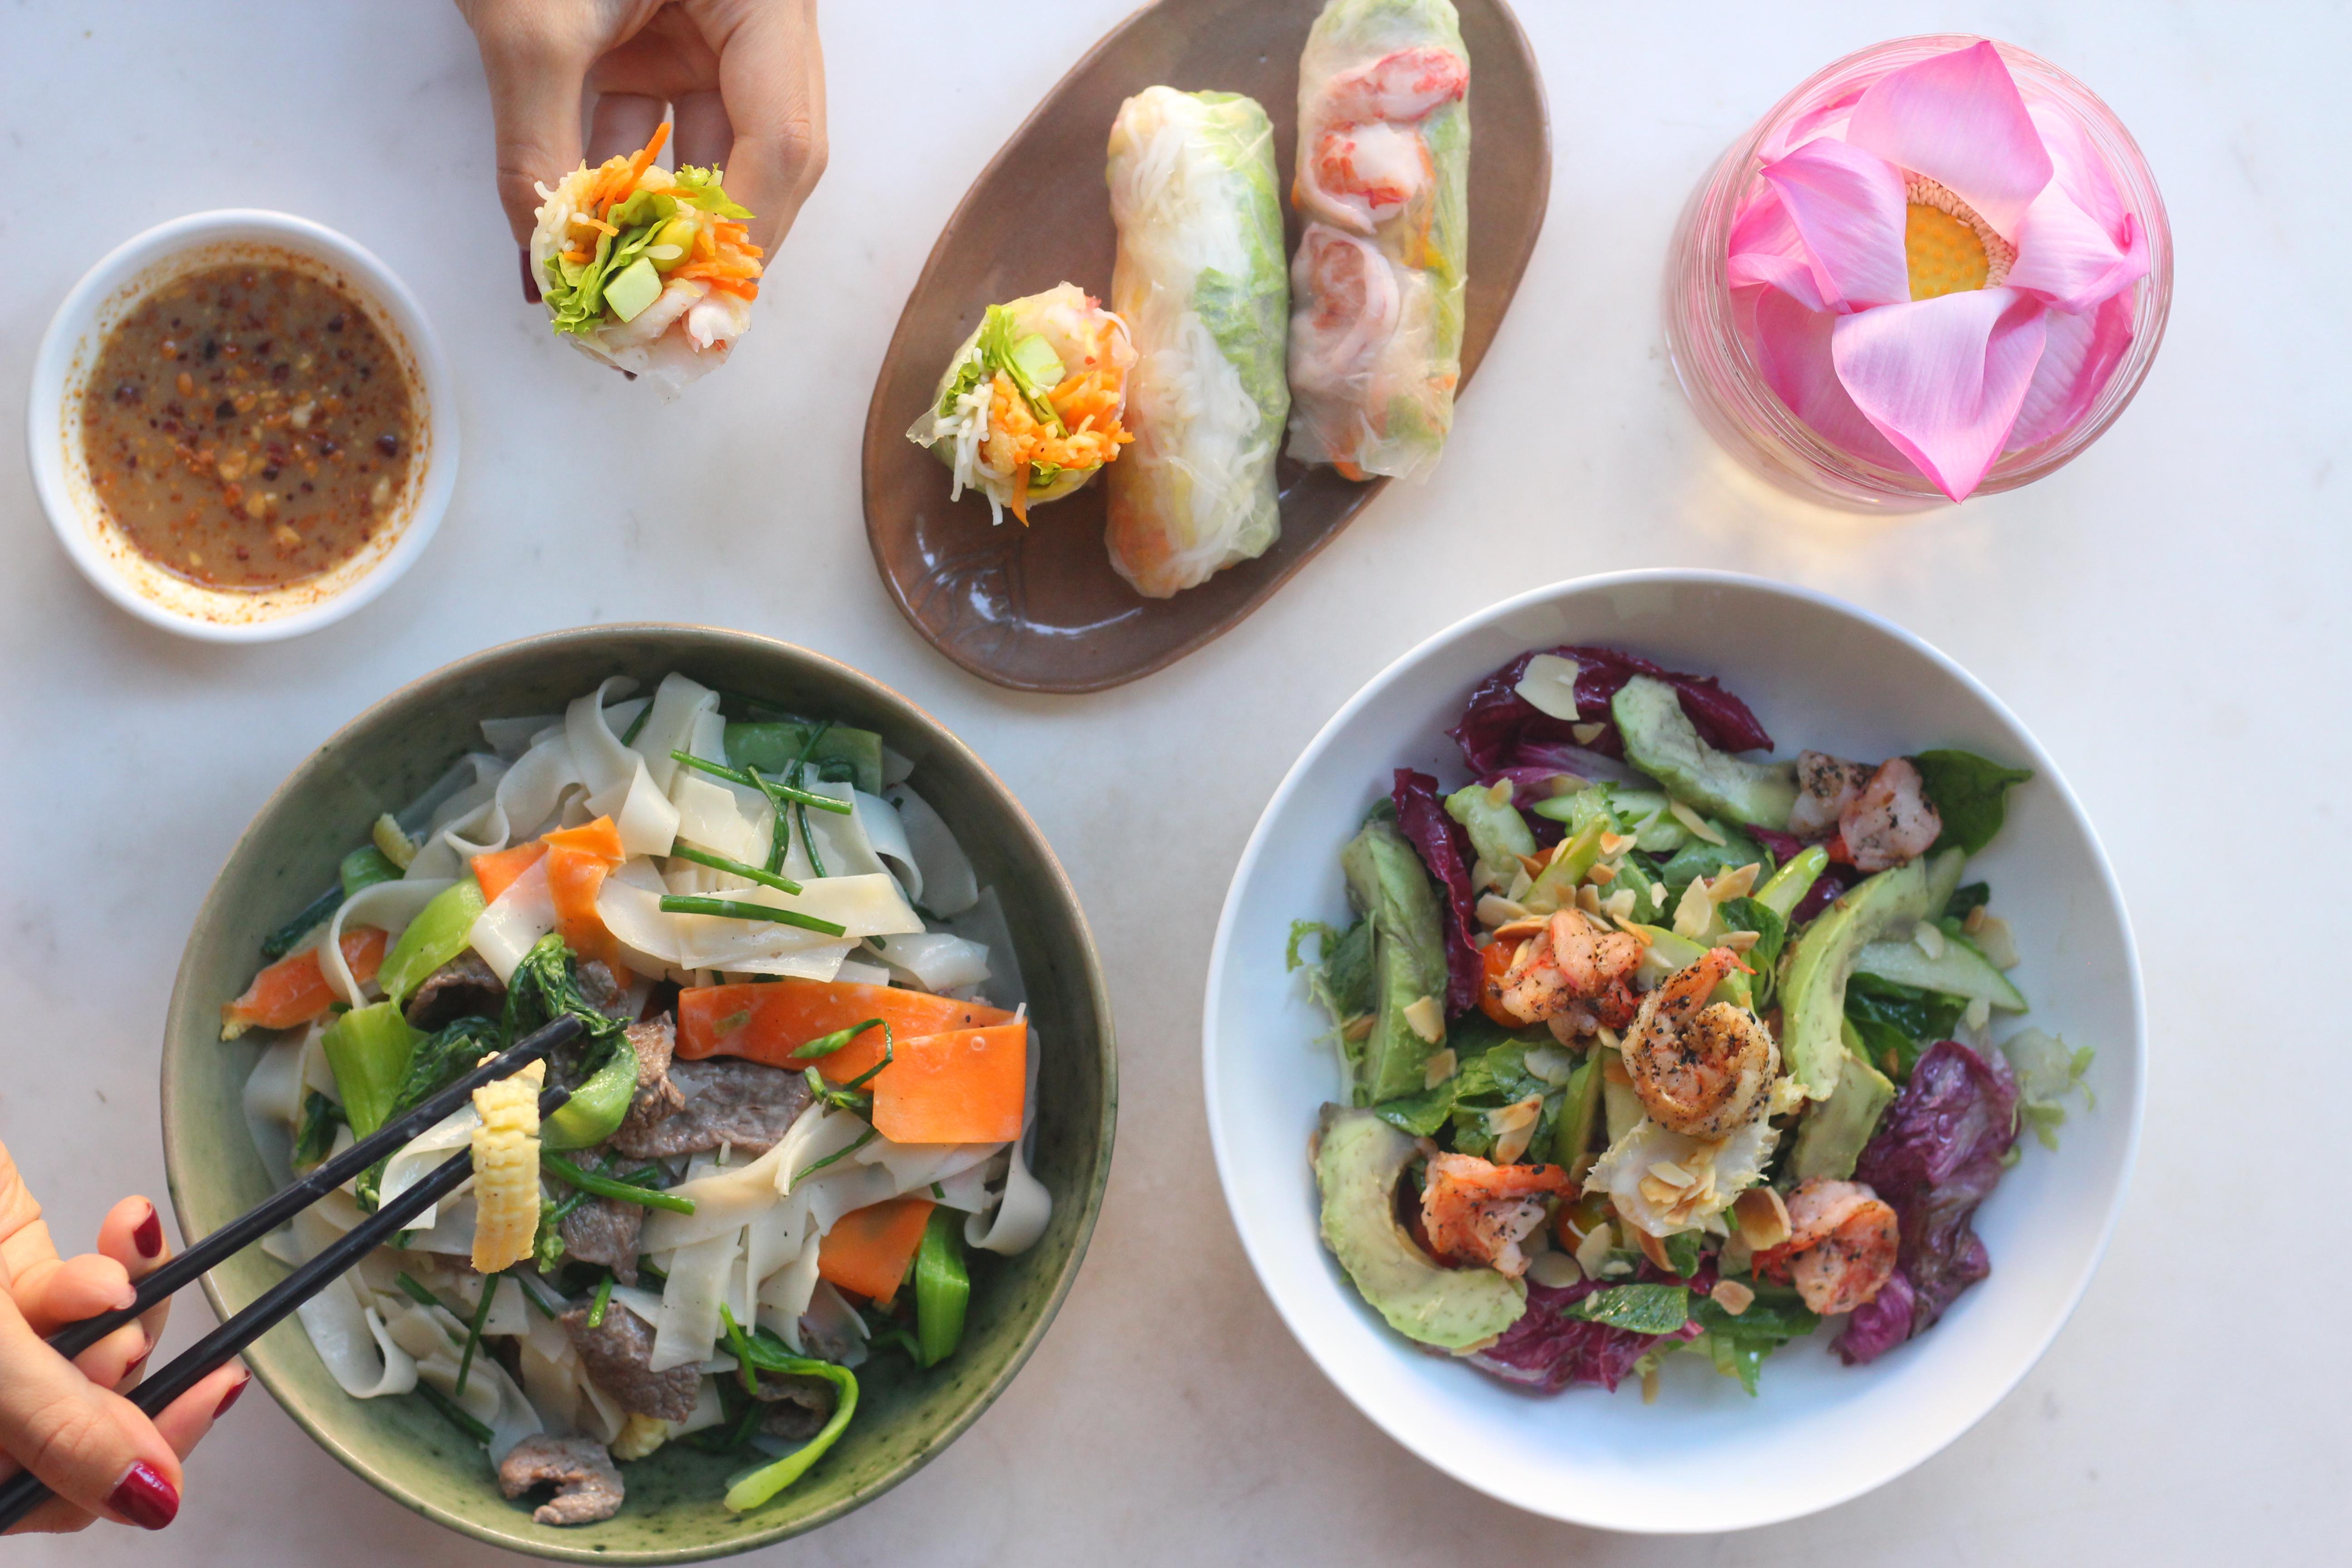 Green Mango Salad from the Park Hyatt Siem Reap